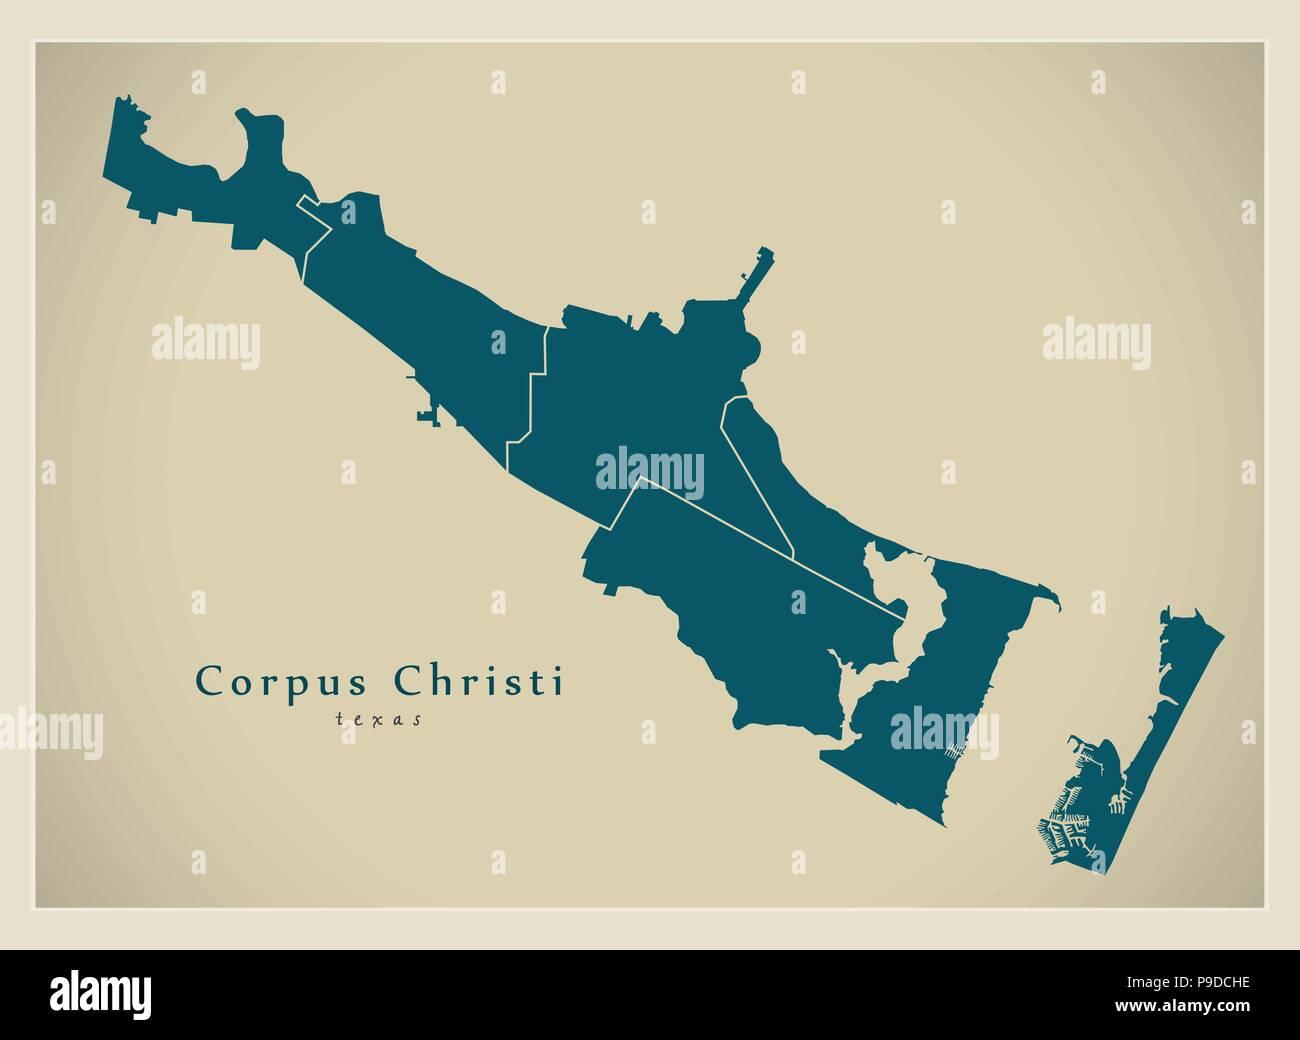 Modern City Map - Corpus Christi Texas city of the USA with neighborhoods - Stock Vector